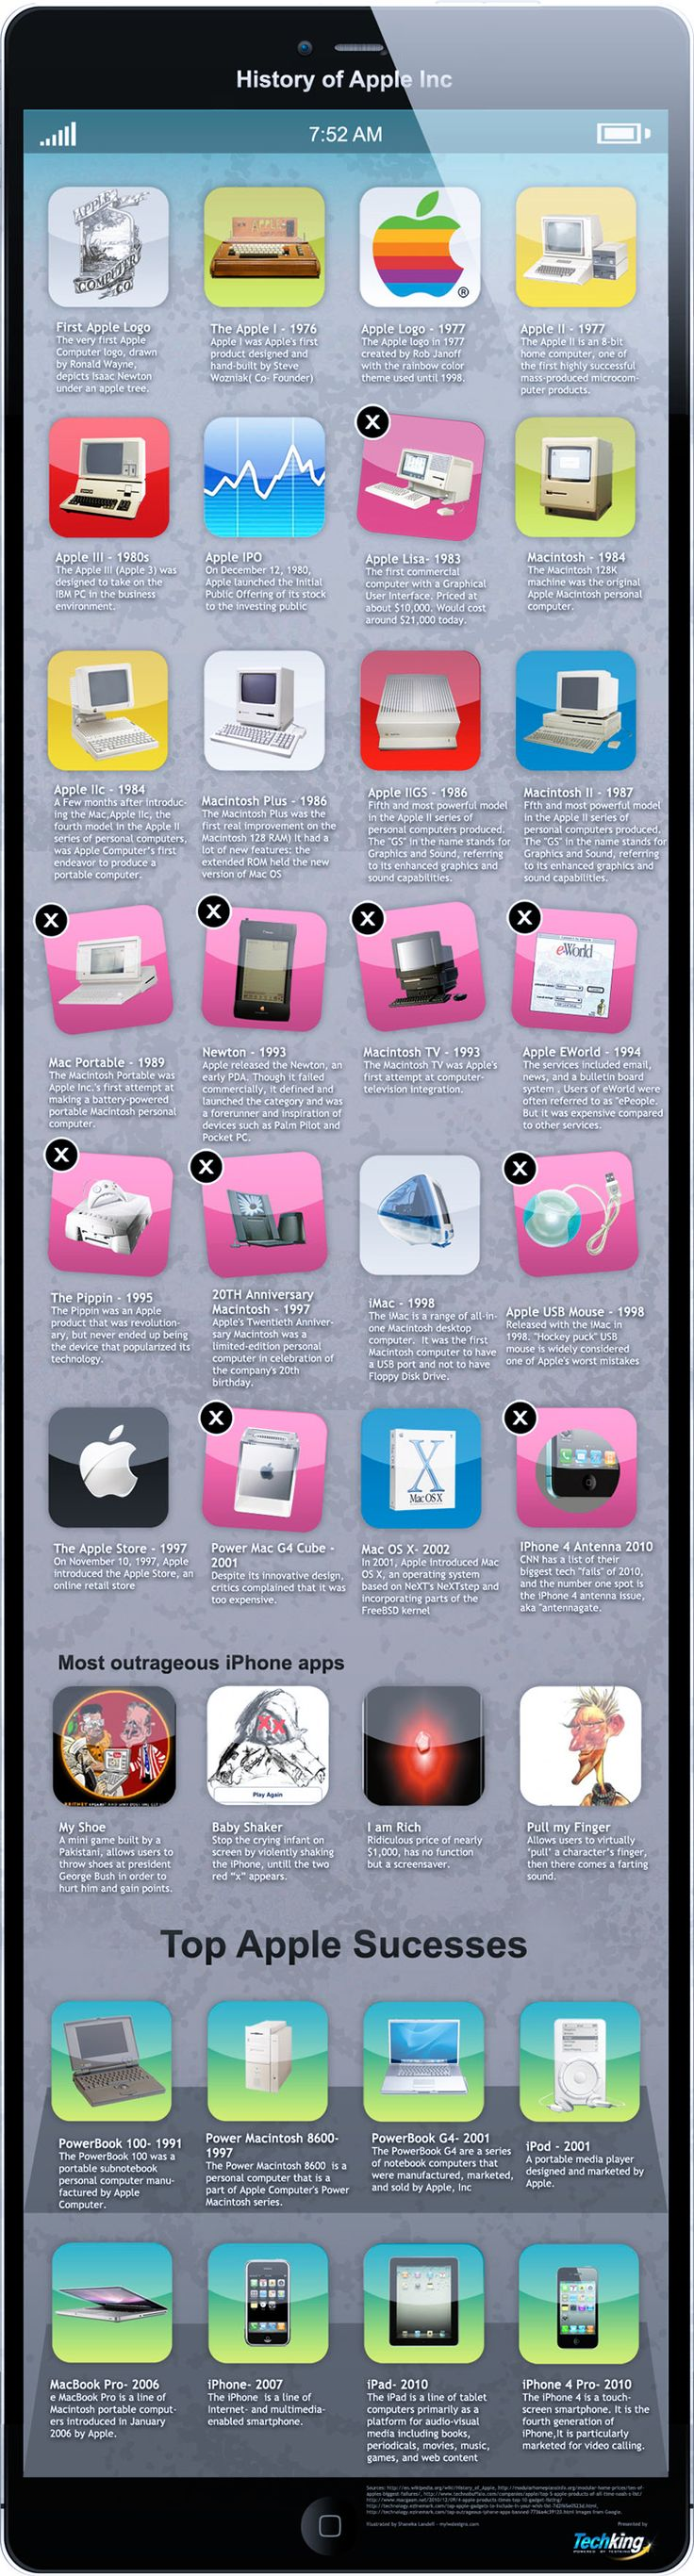 History of Apple Inc